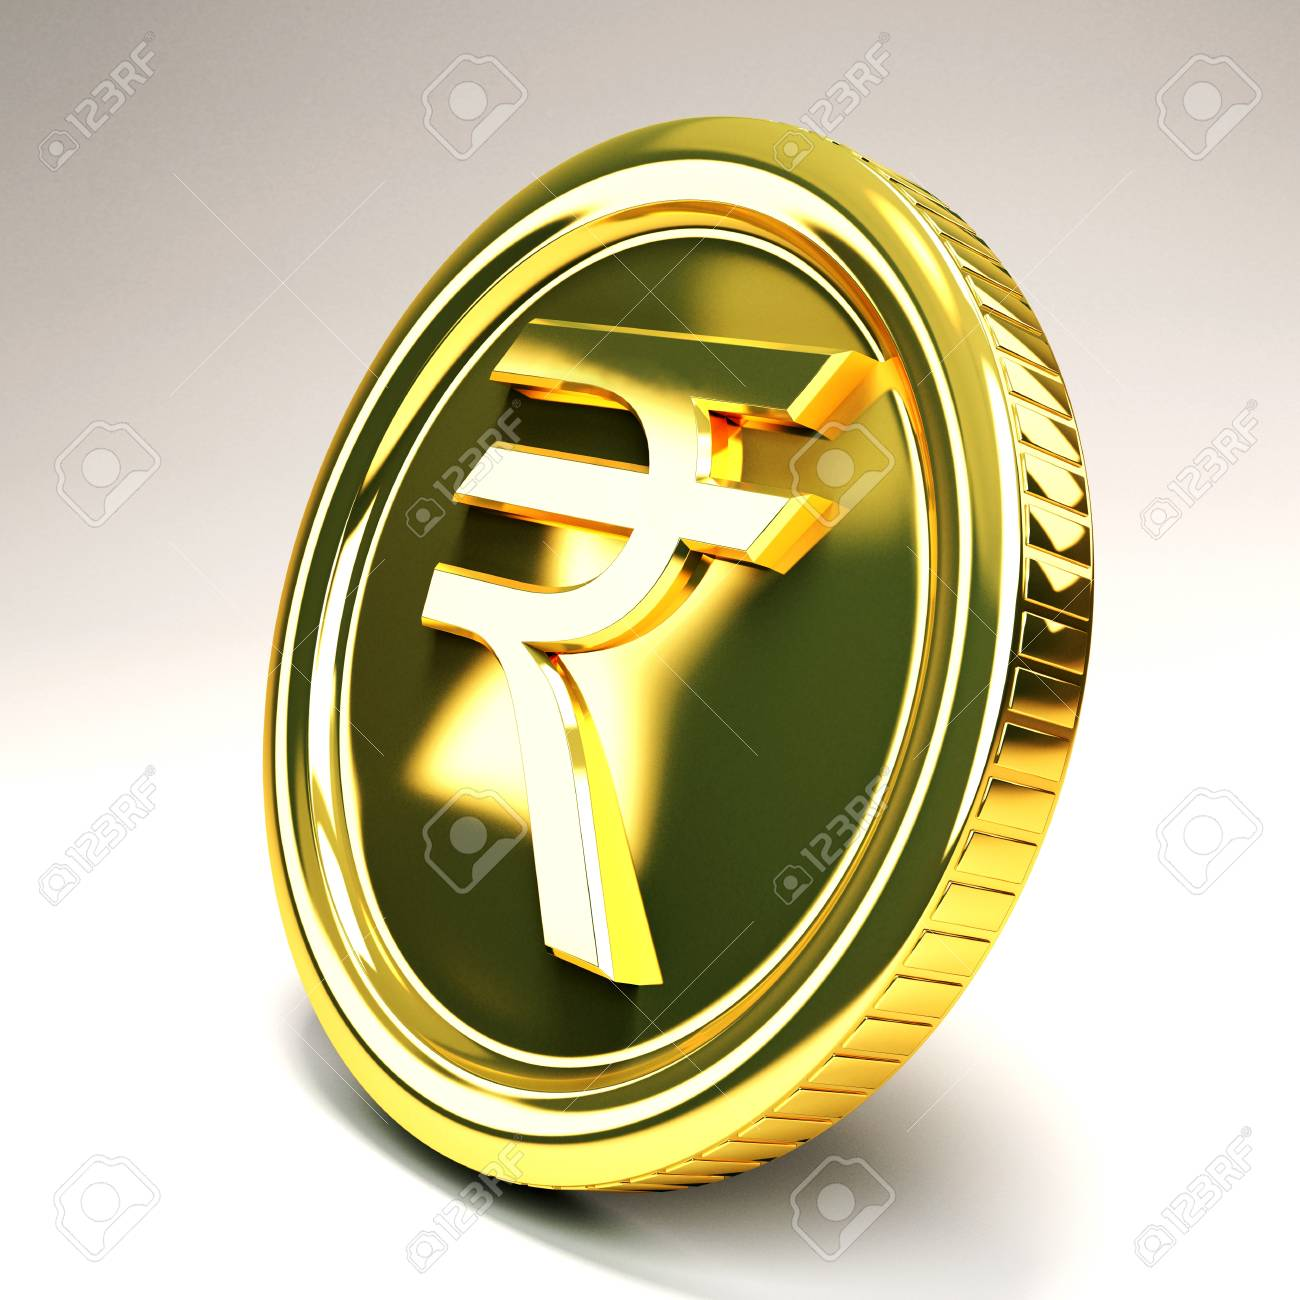 Rupee Gold Coin Stock Photo - 12914161